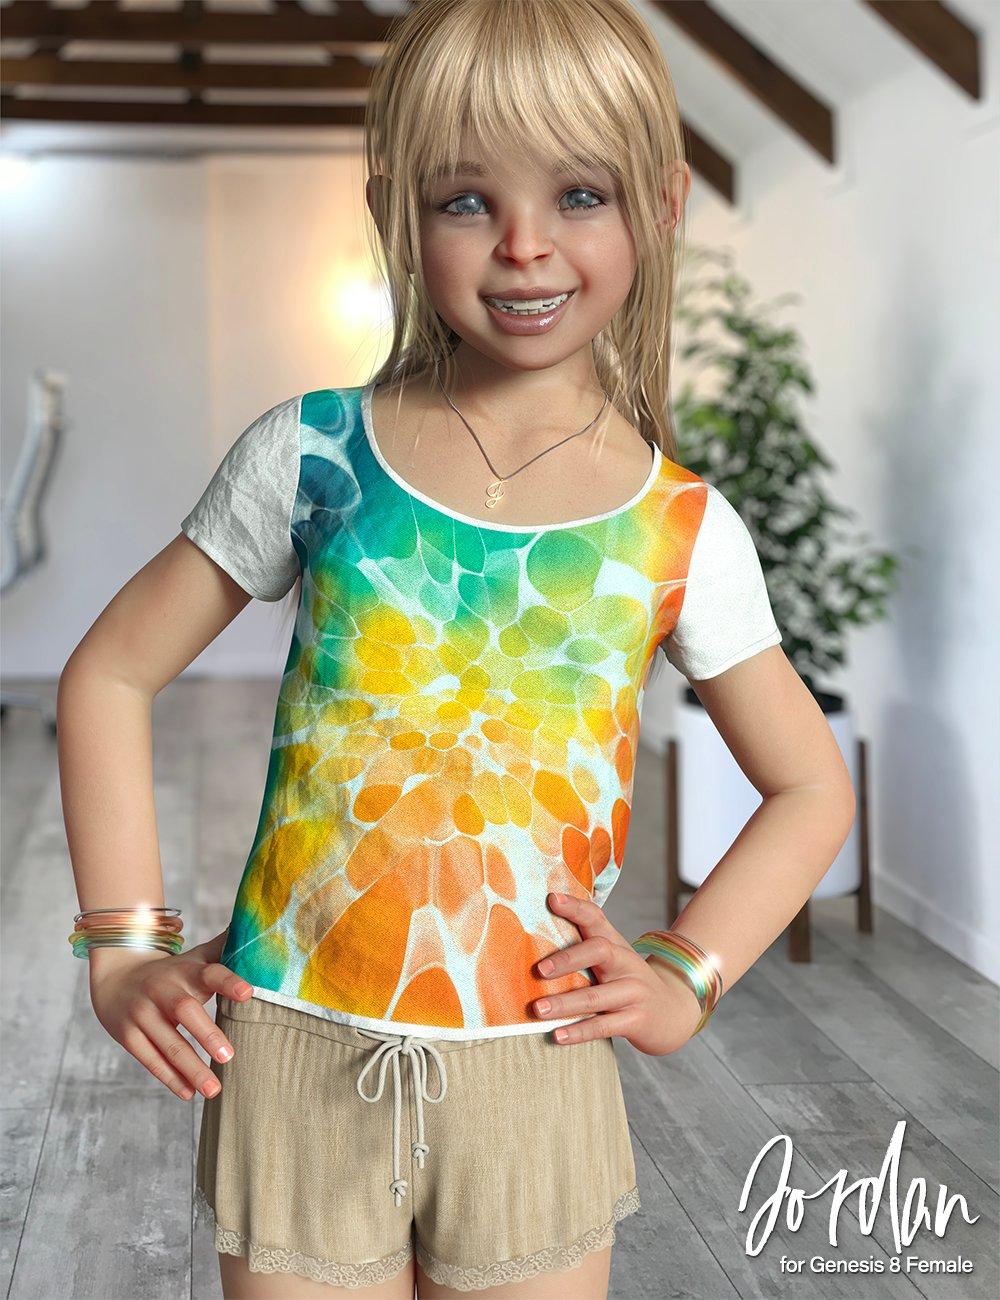 Jordan Character for Genesis 8 Females by: 3D Universe, 3D Models by Daz 3D